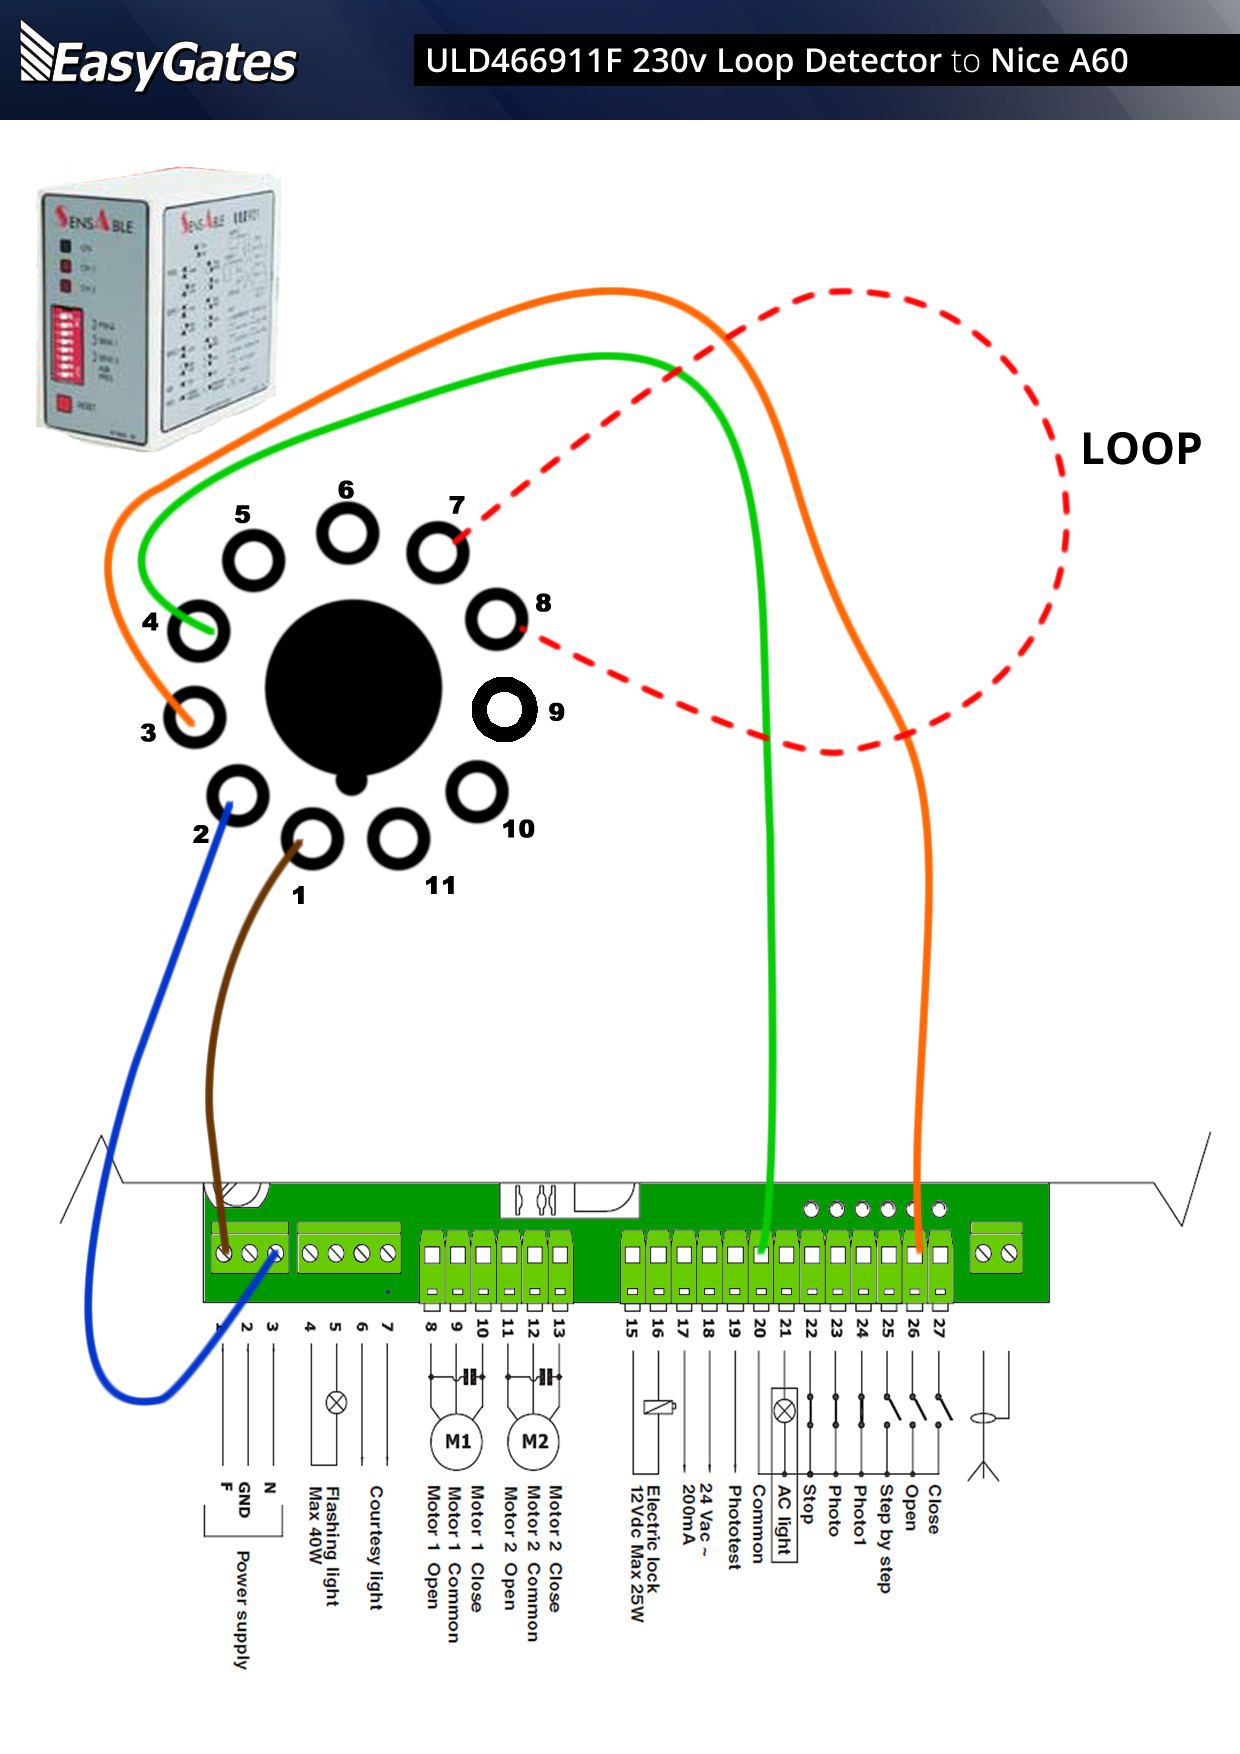 230 volt loop detector to nice a60 control board. Black Bedroom Furniture Sets. Home Design Ideas